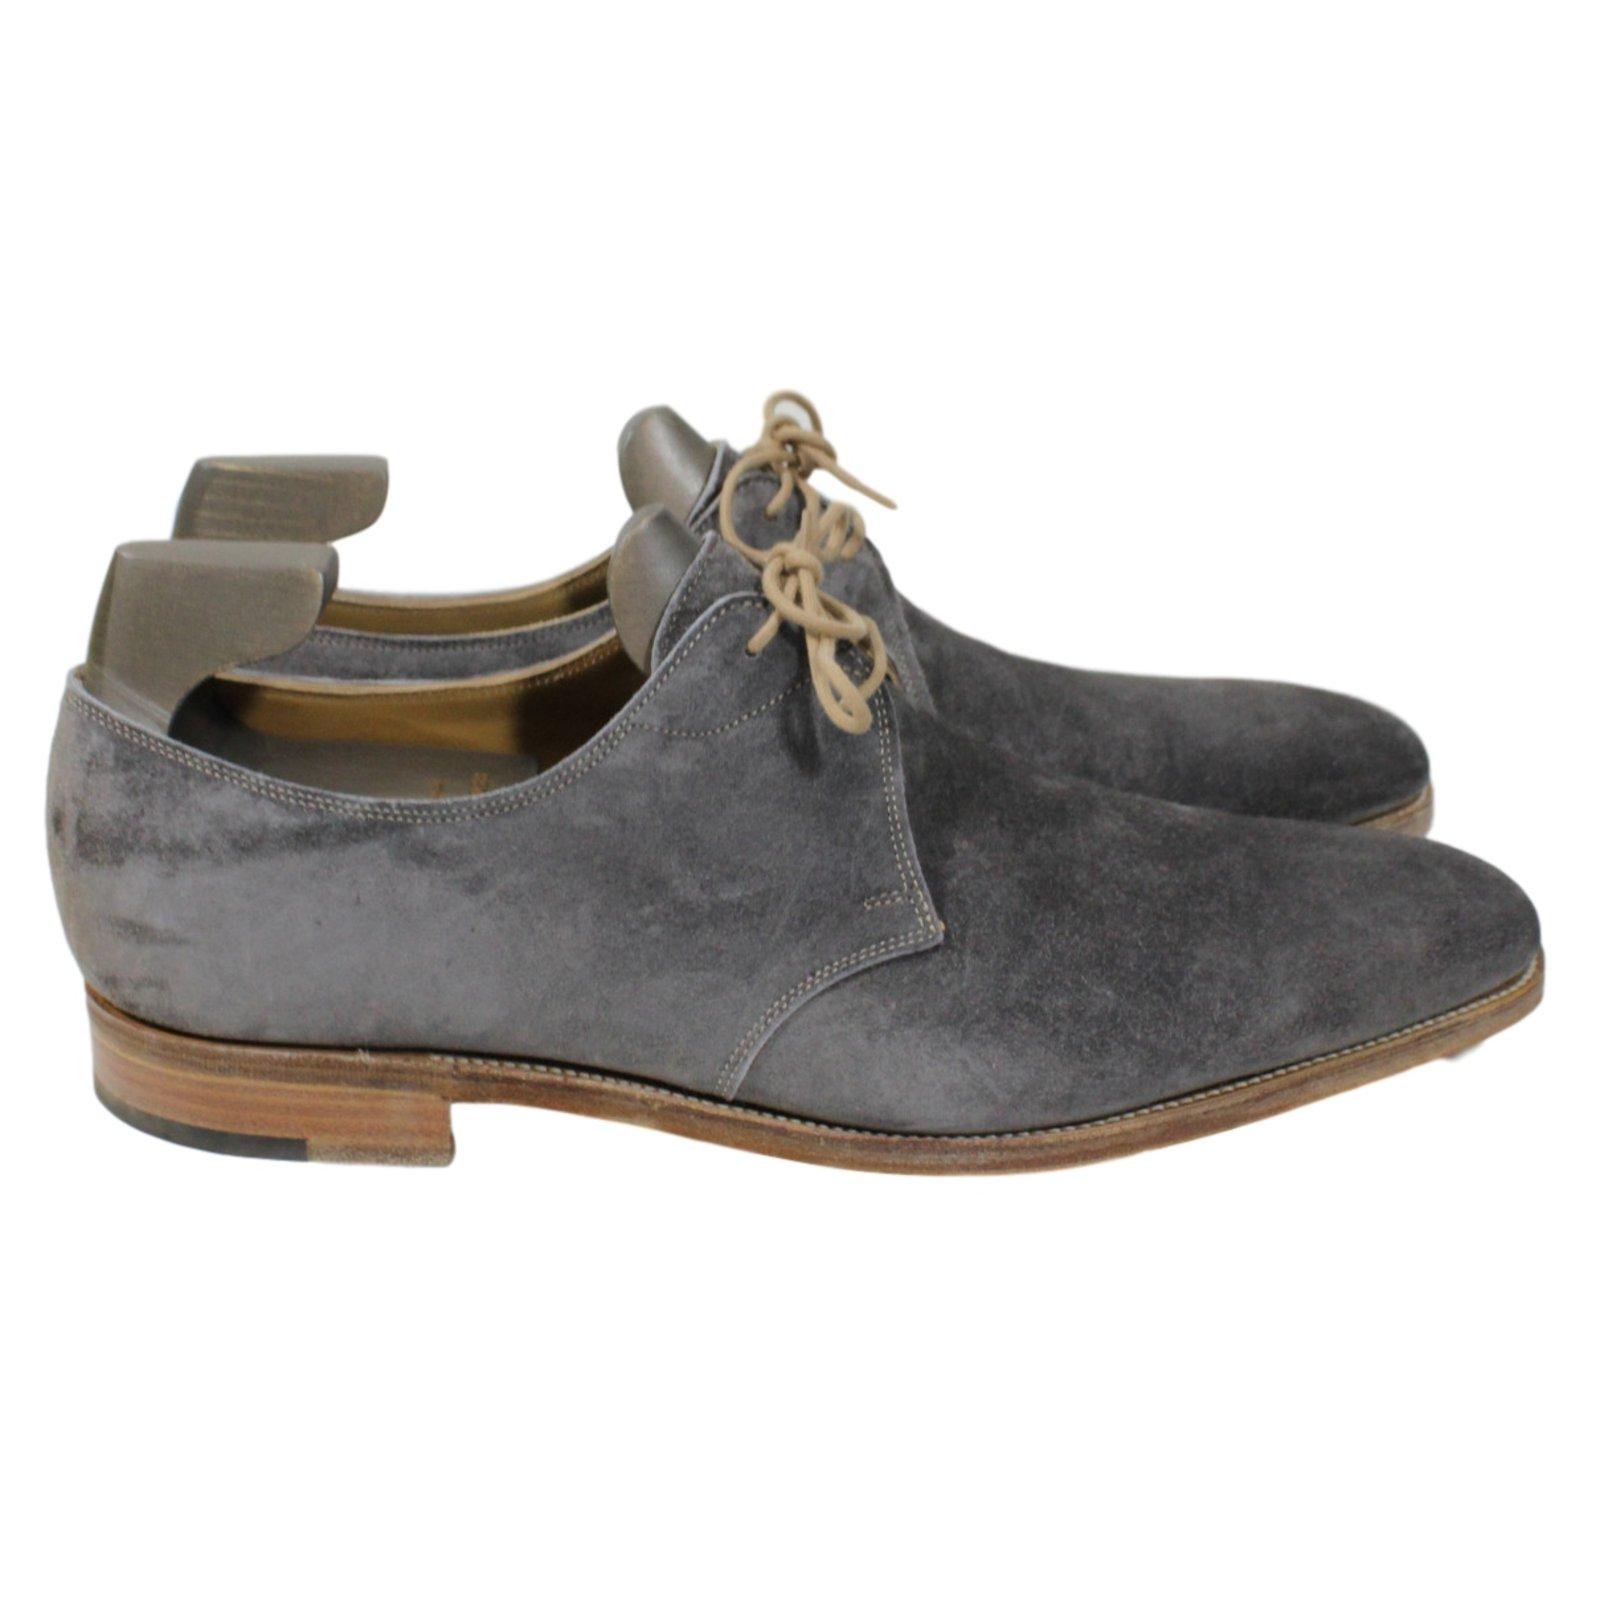 Chaussure en daim gris - Laver chaussure en daim ...